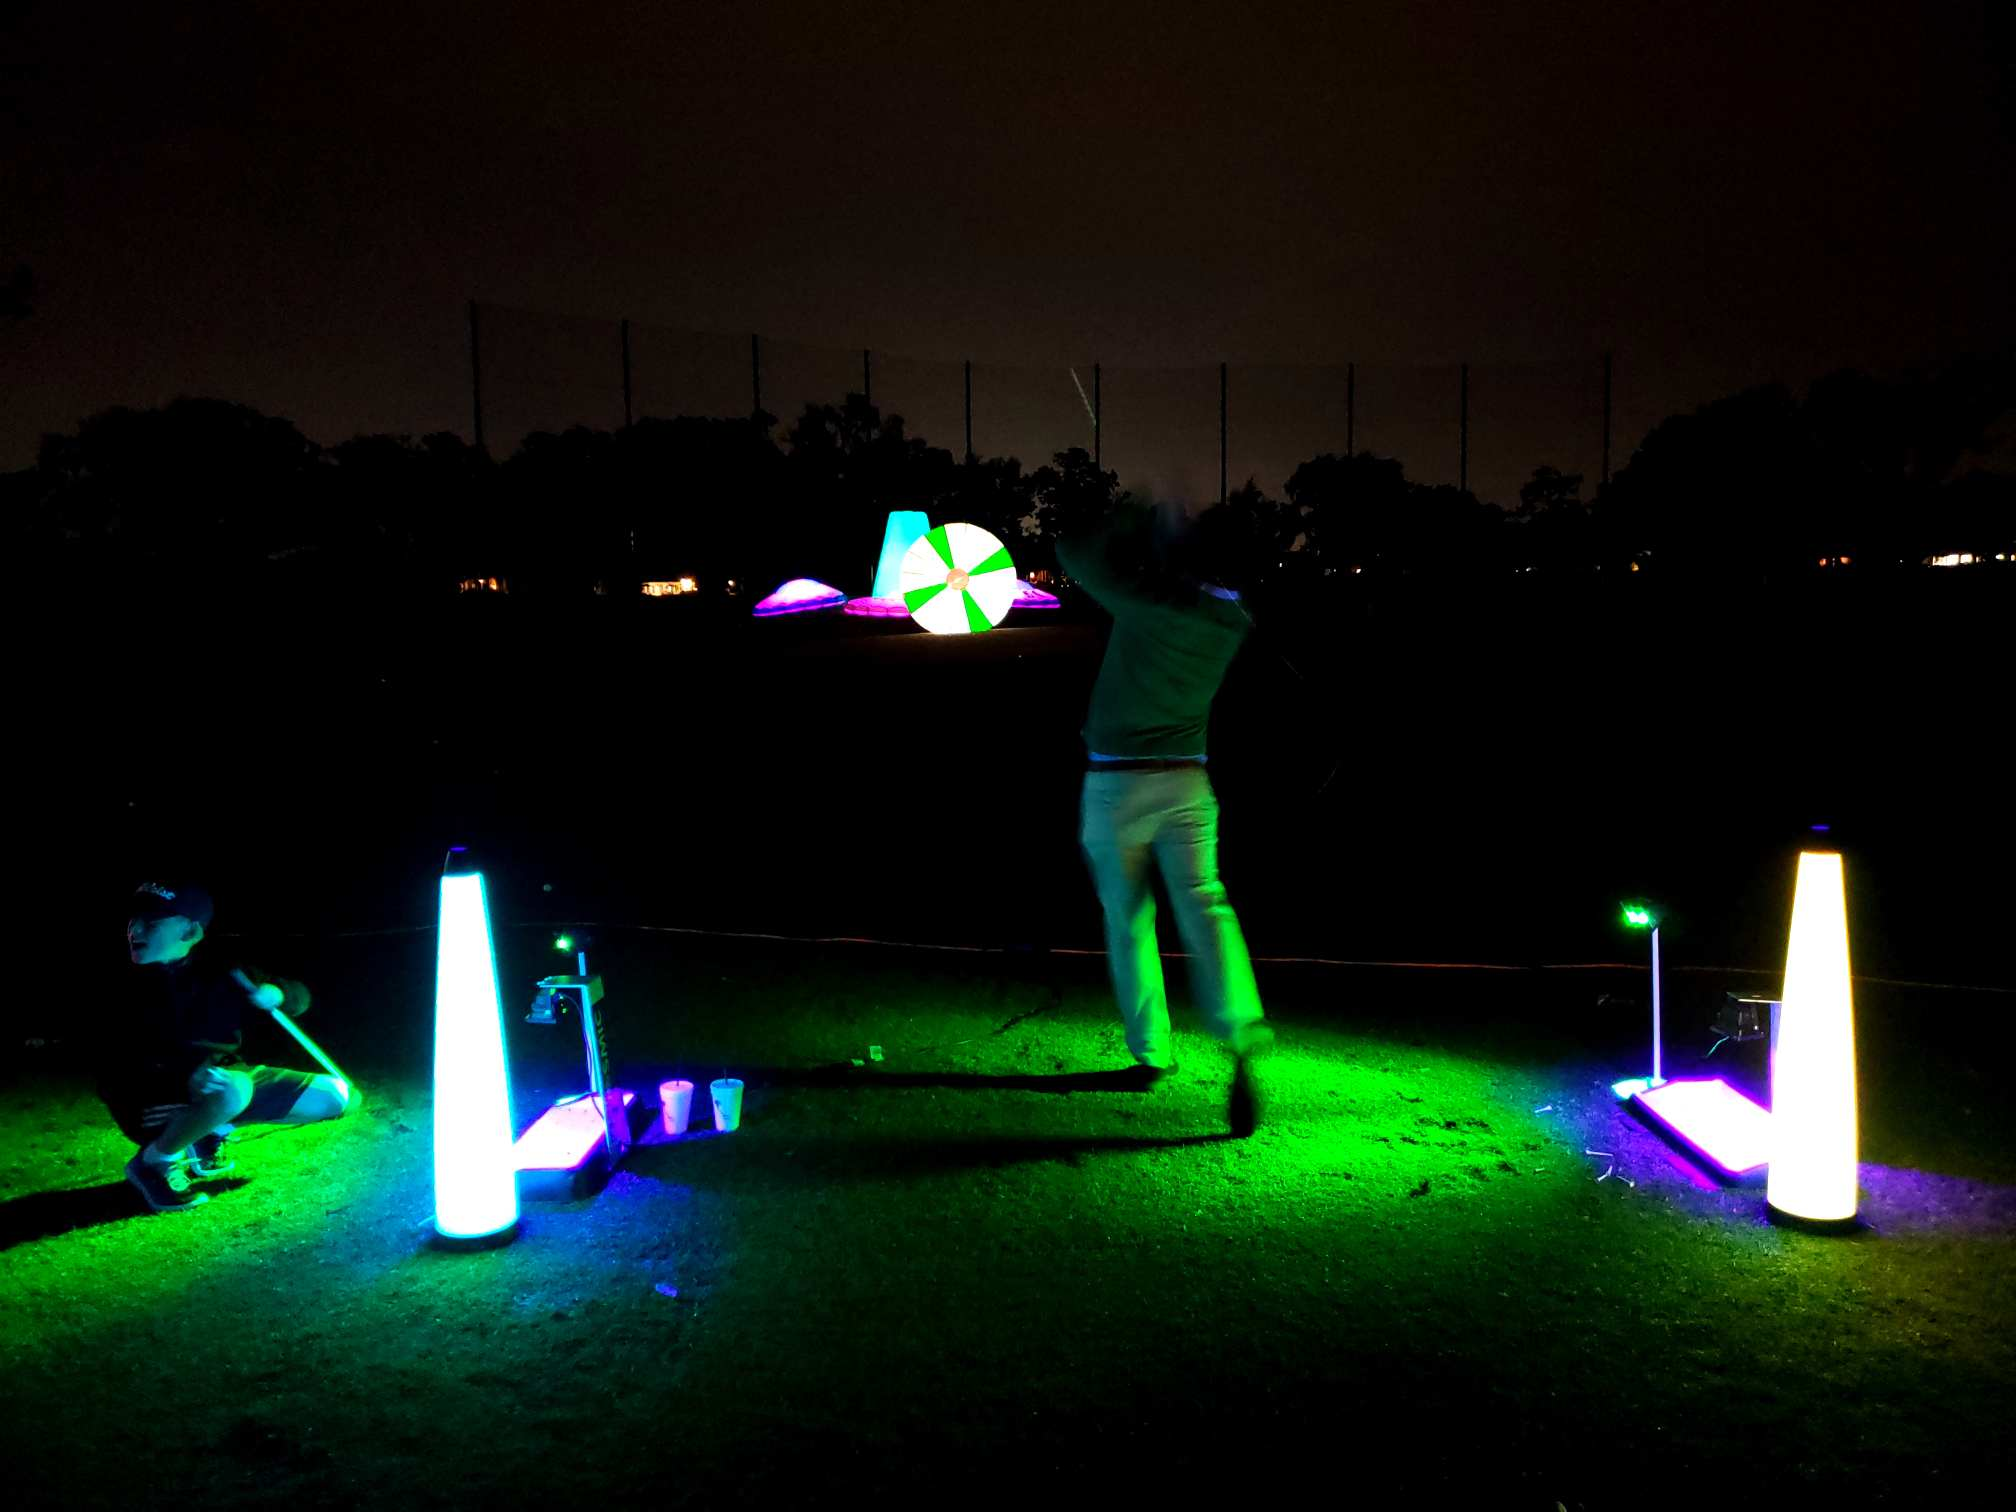 Hitting golf targets on the driving range